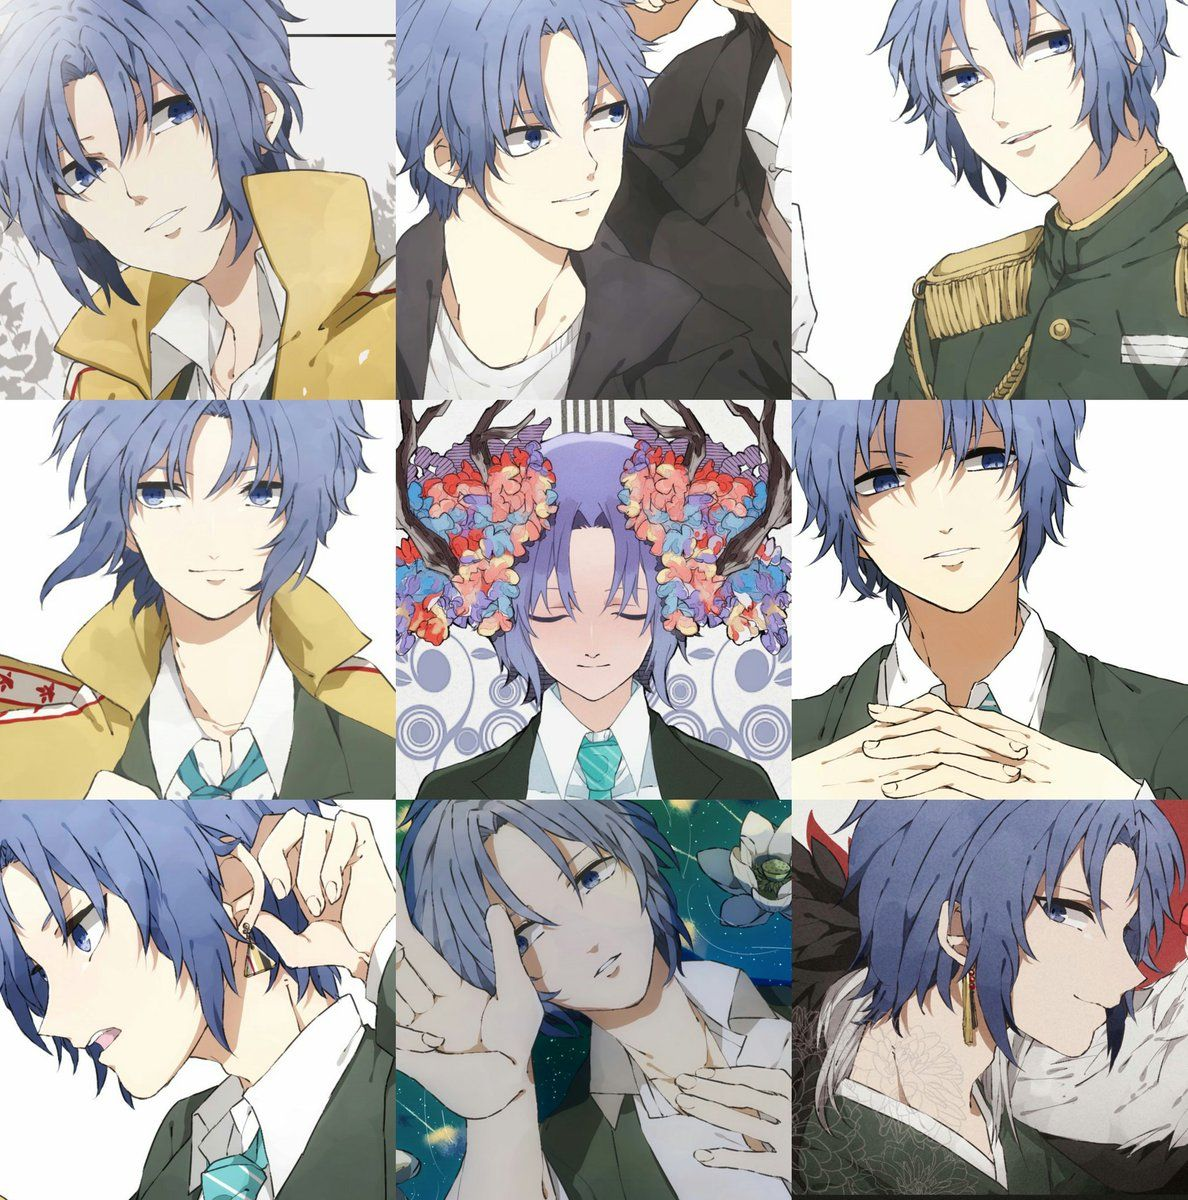 Yukimura テニプリ, テニスの王子様, 王子様